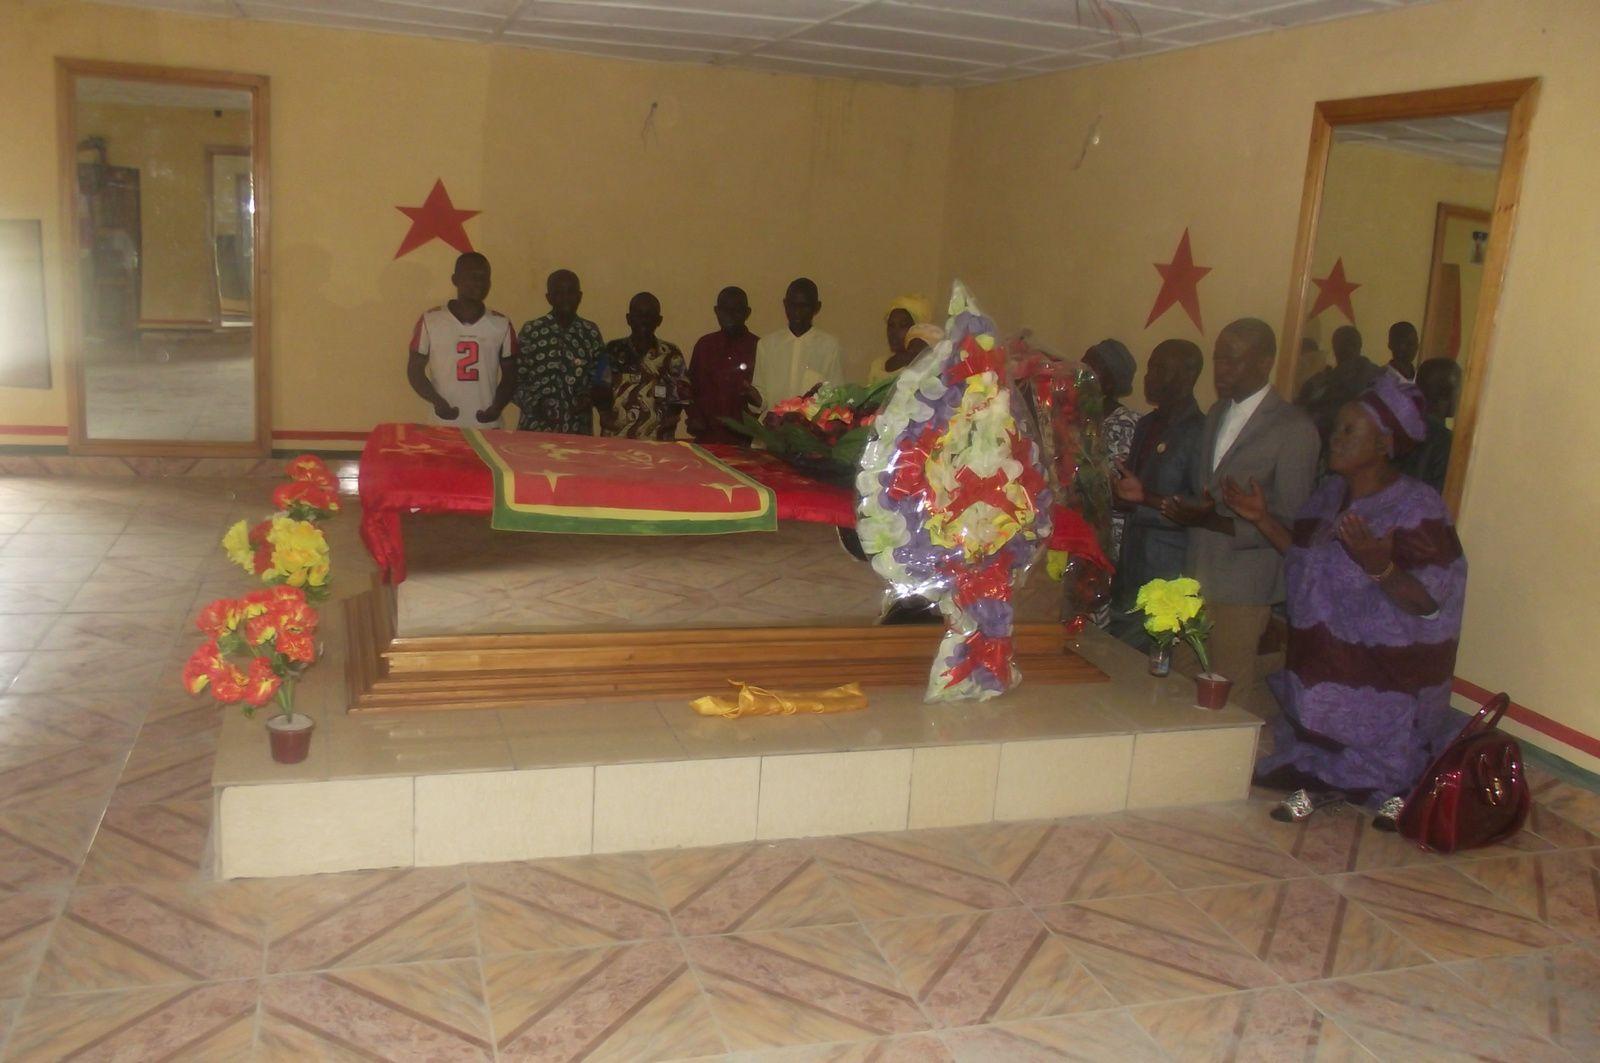 La Chambre du Mausolée où repose Mpadi - Une image de Ndona Kimpa Vita- Mausolée de Mpadi après travaux de réfection